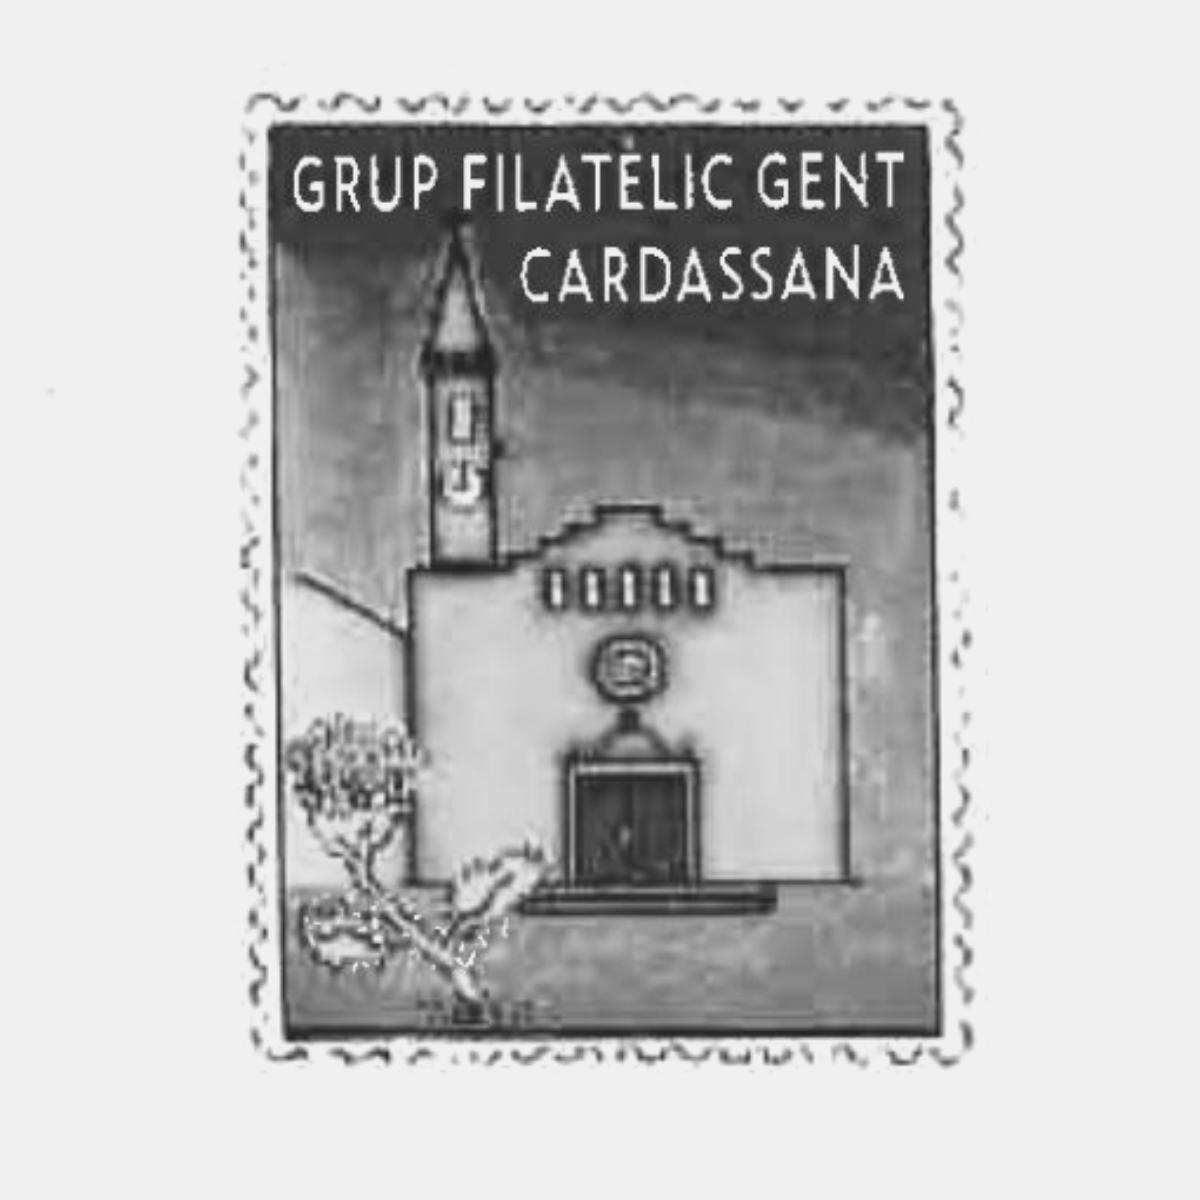 Grup Filatèlic Gent Cardassana